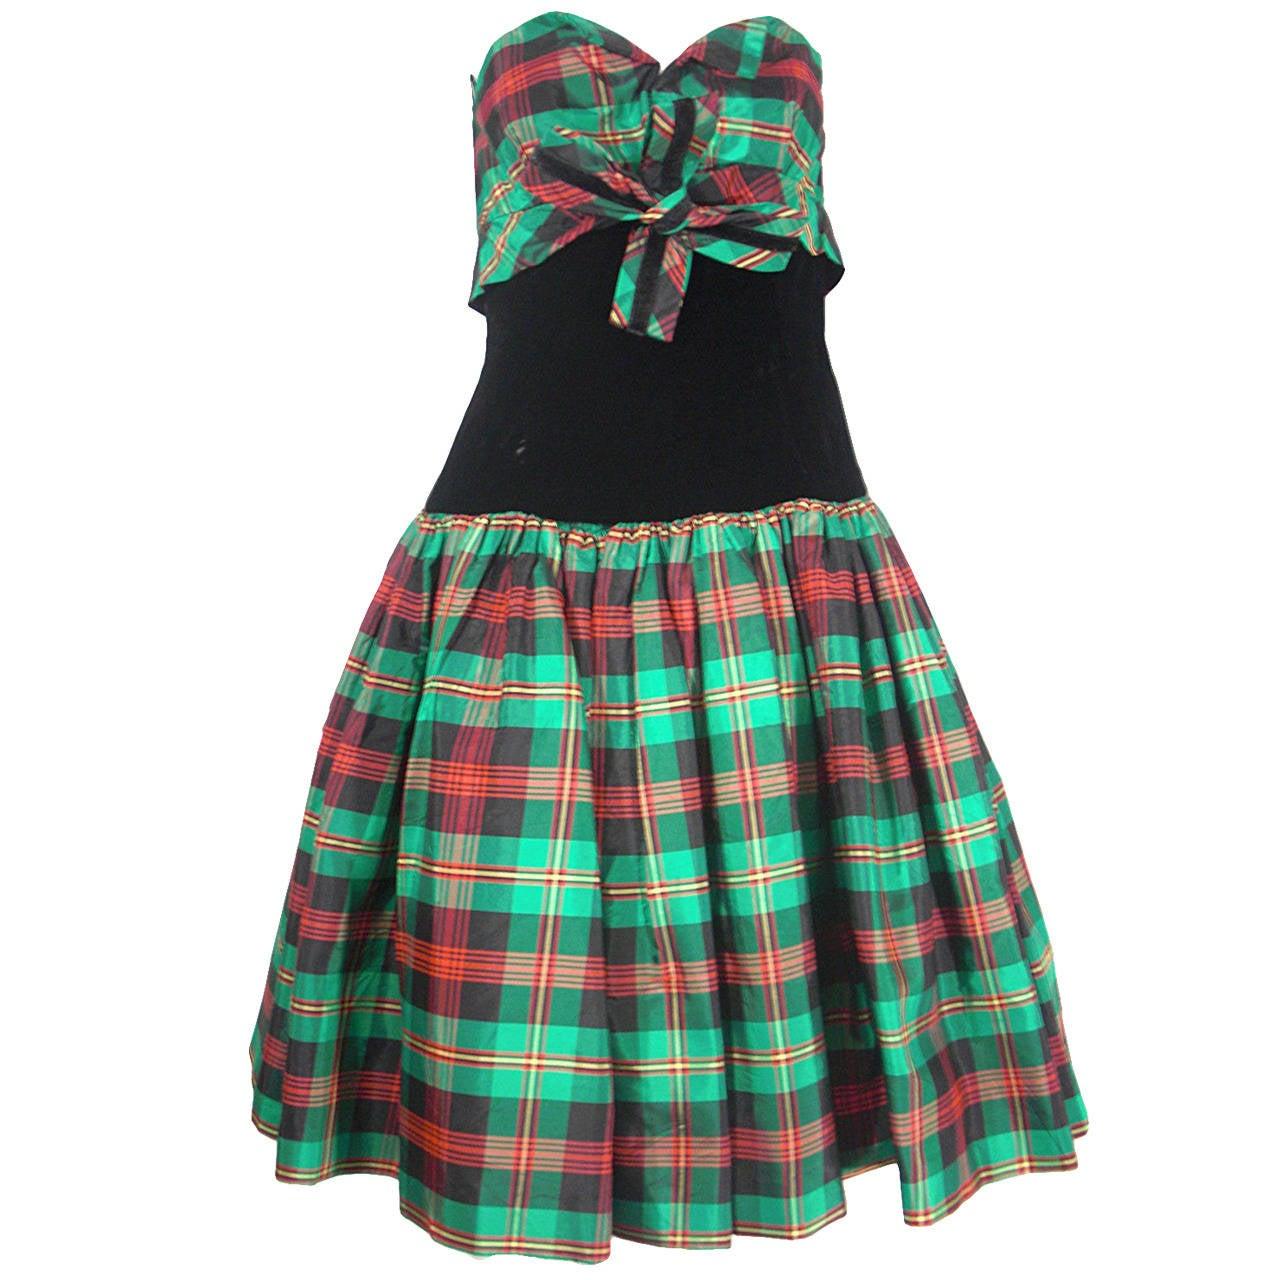 Victor Costa for SAKS 5th Avenue Green Plaid and Velvet Dress 1